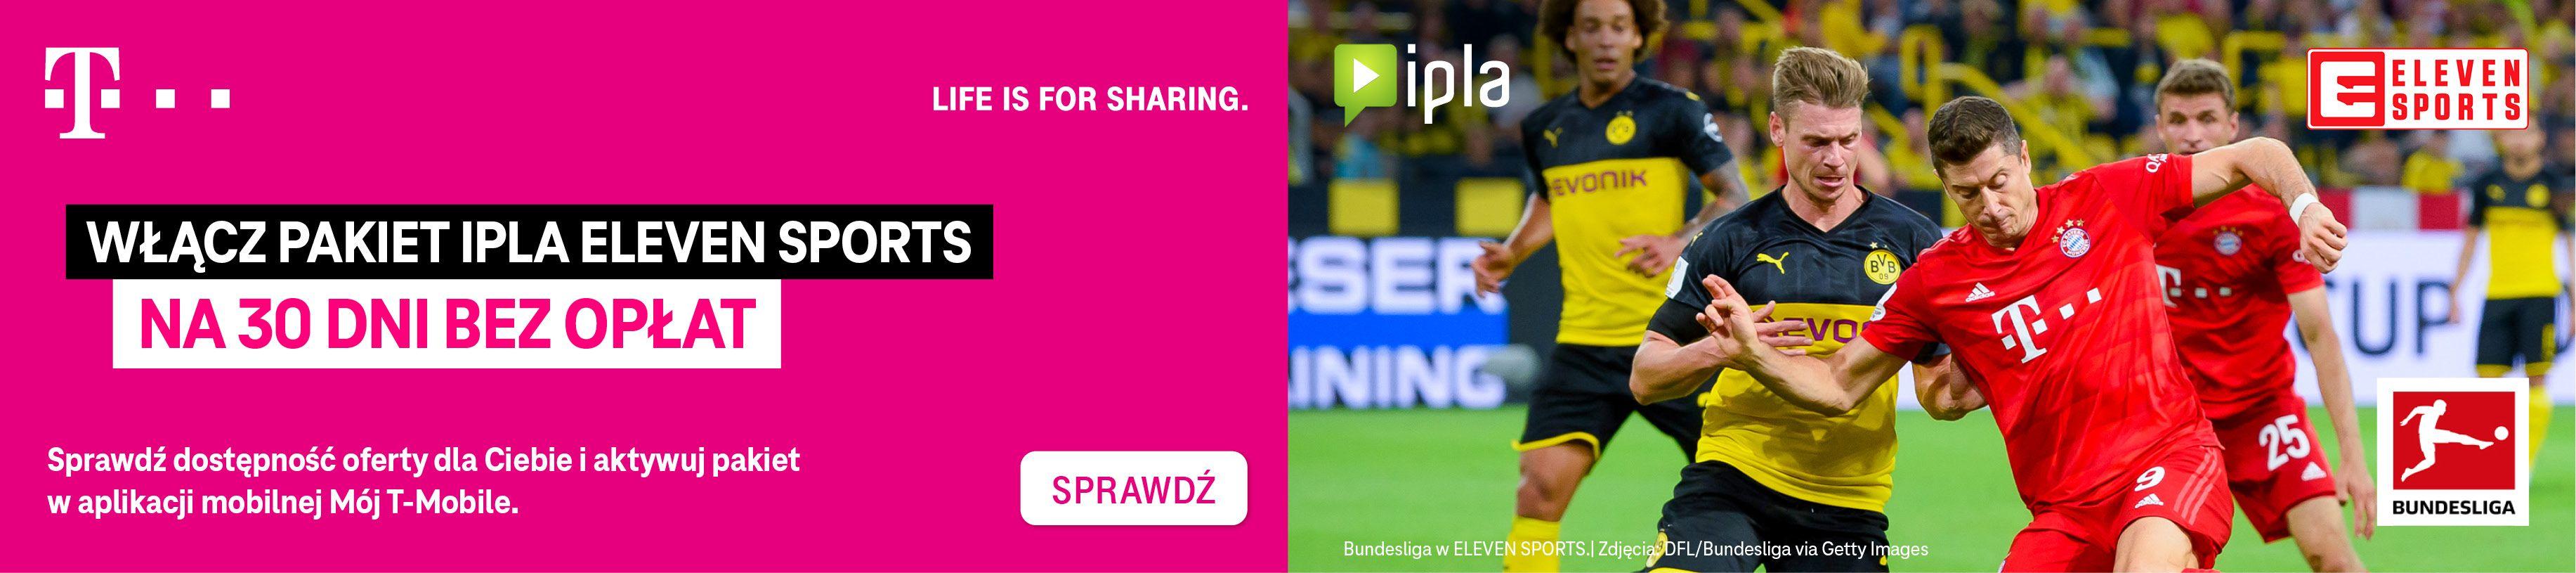 Ipla Eleven Sports od T-Mobile za 0zł na 30 dni